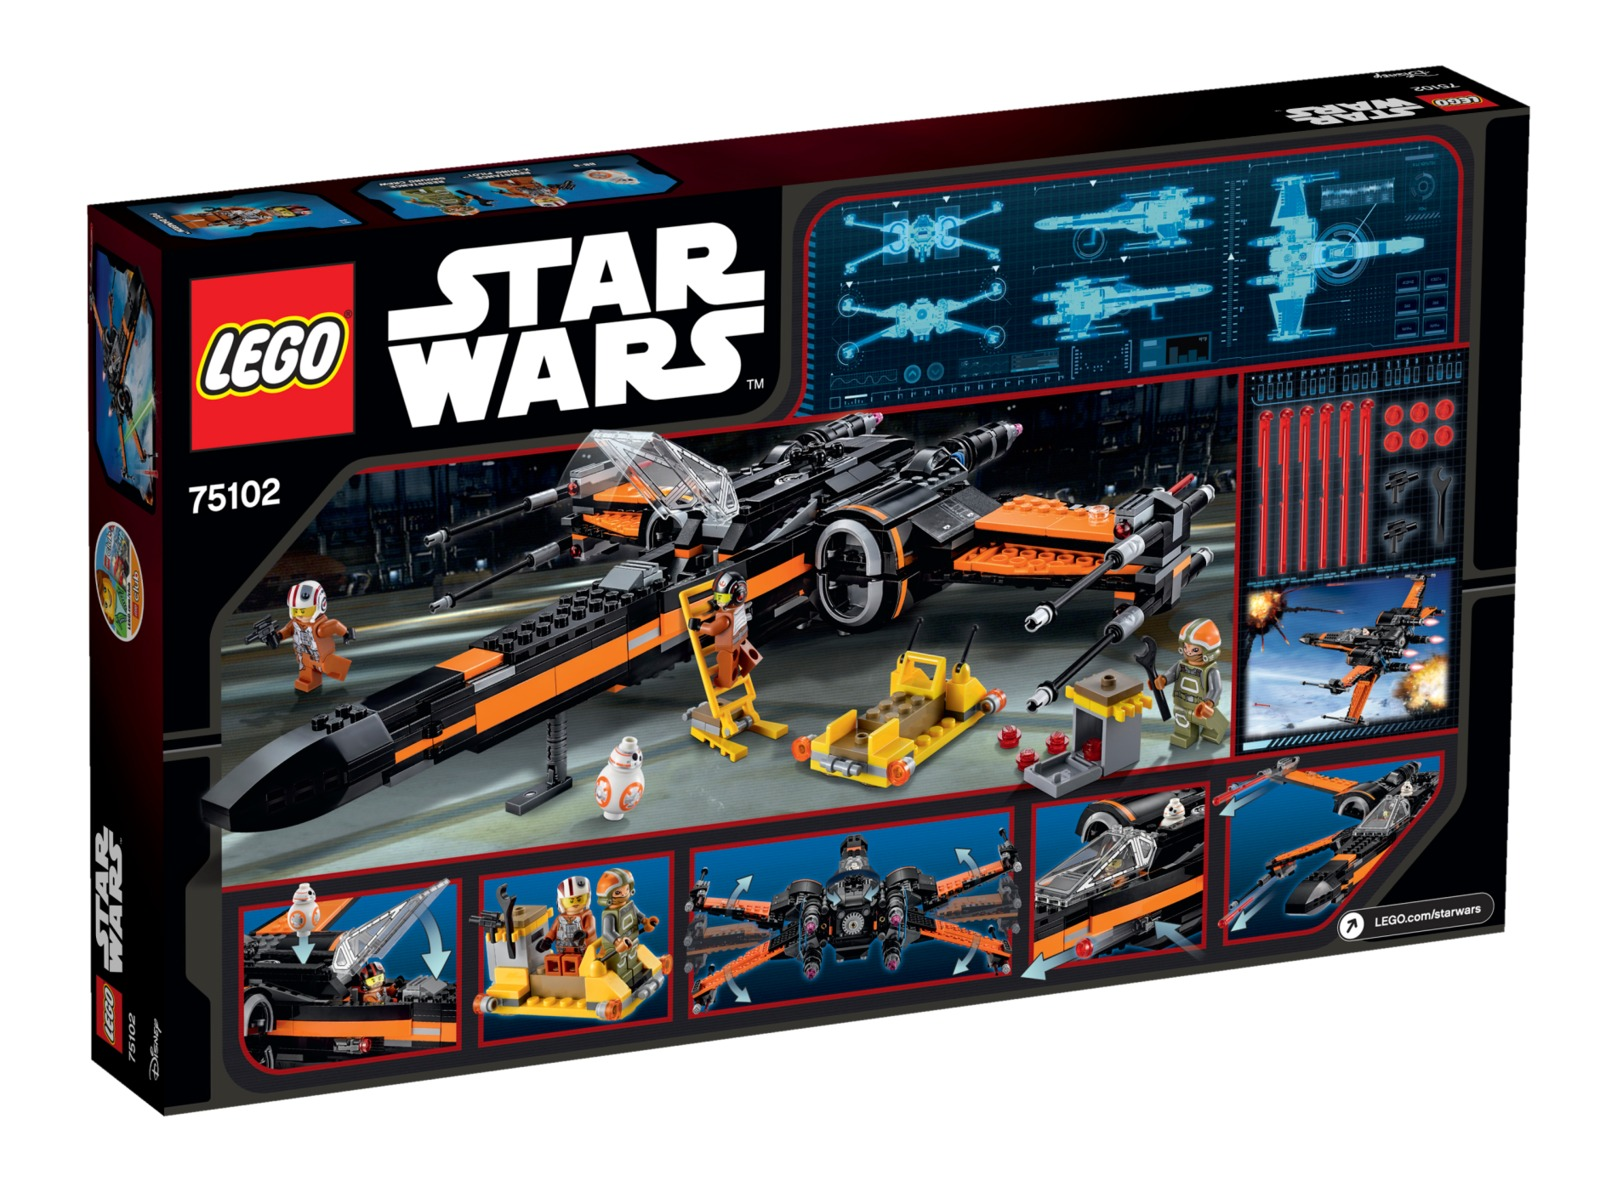 LEGO Star Wars: Poe's X-Wing Starfighter (75102) image